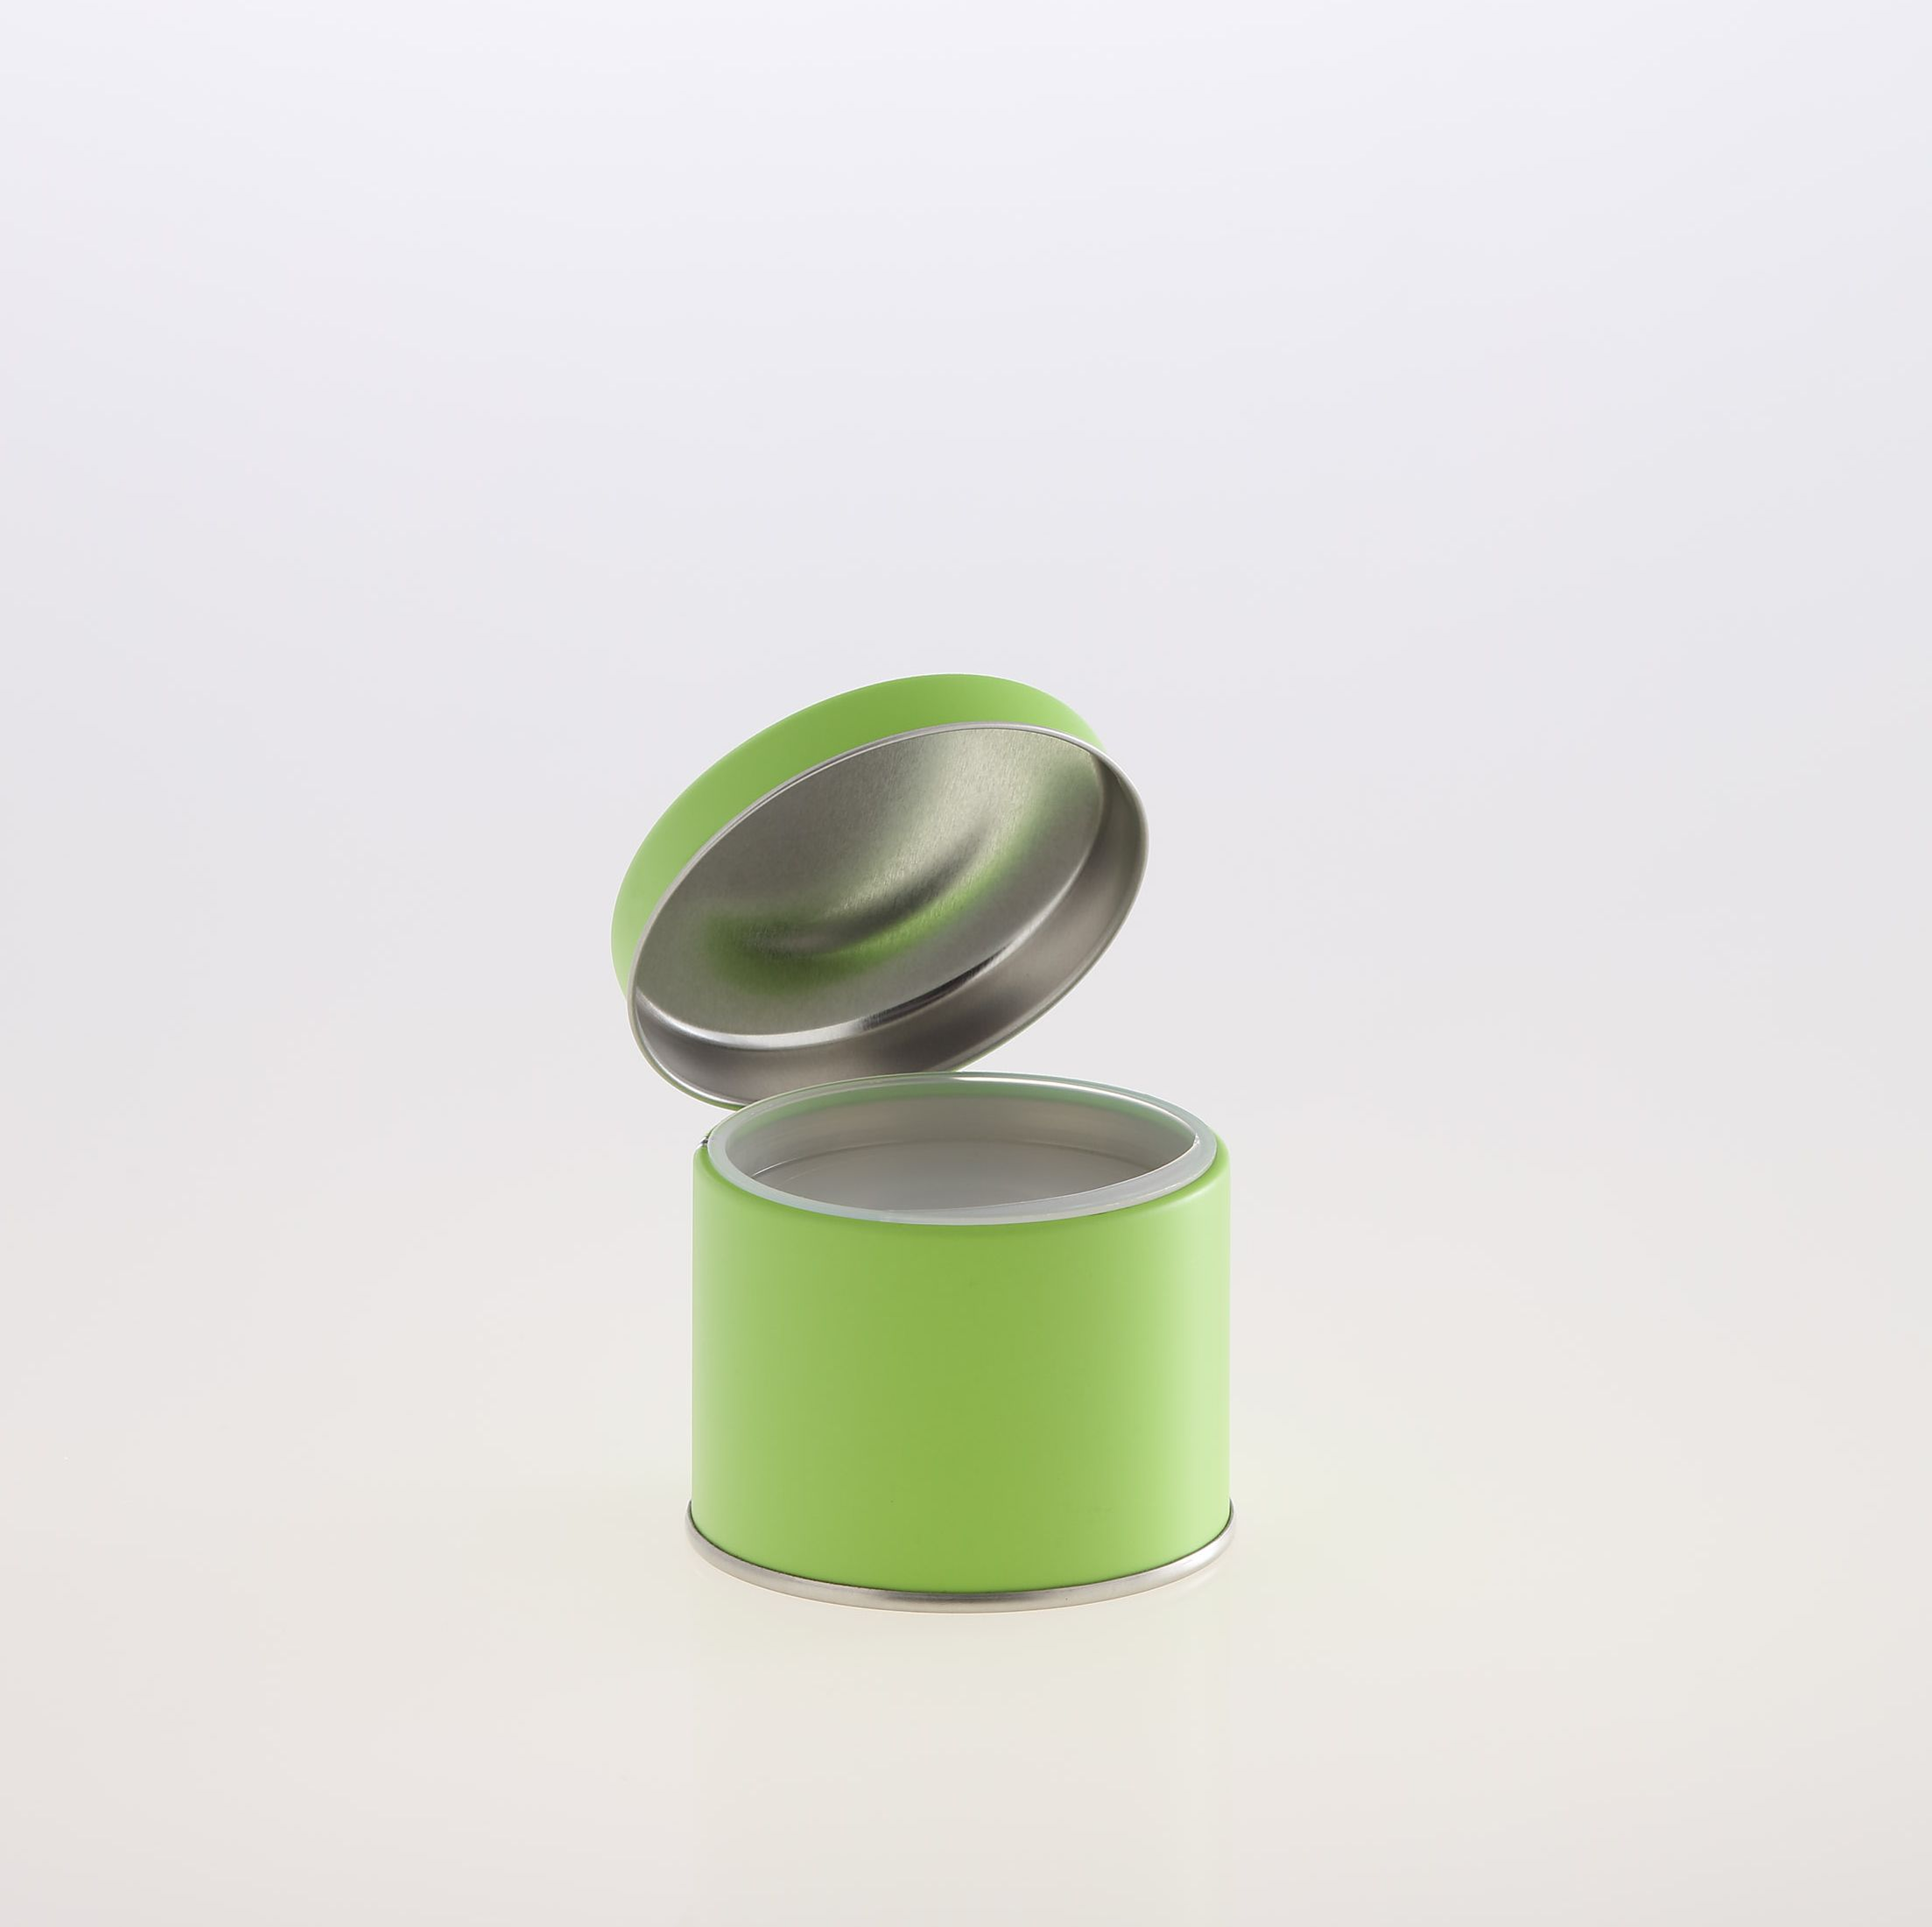 Aroma-Dose 73/55 grün 200 ml